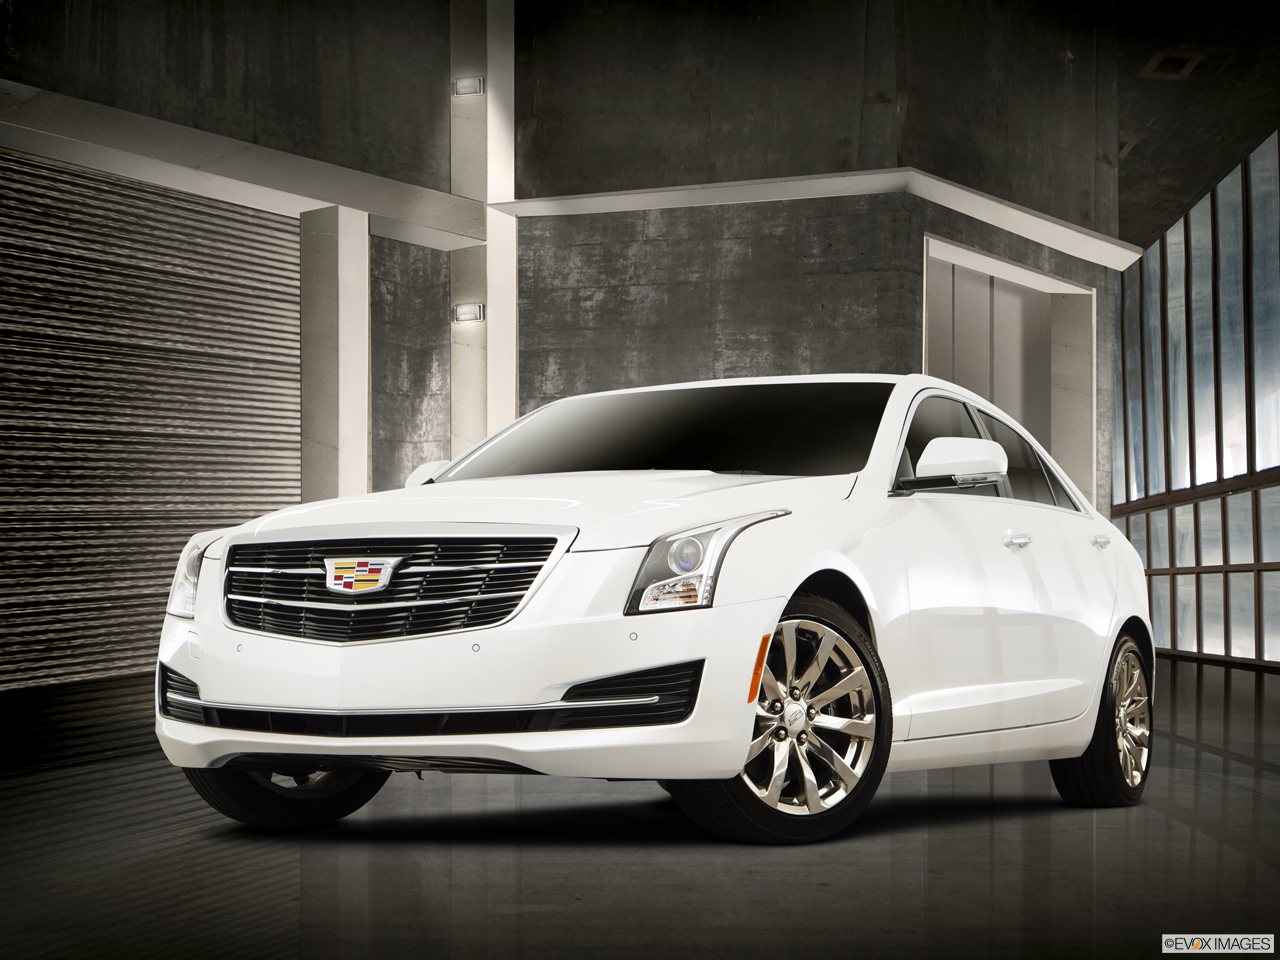 2013 Cadillac Ats 2.0 L Turbo >> Car Pictures List for Cadillac ATS 2017 2.0L Turbo Premium Luxury (Qatar) | YallaMotor